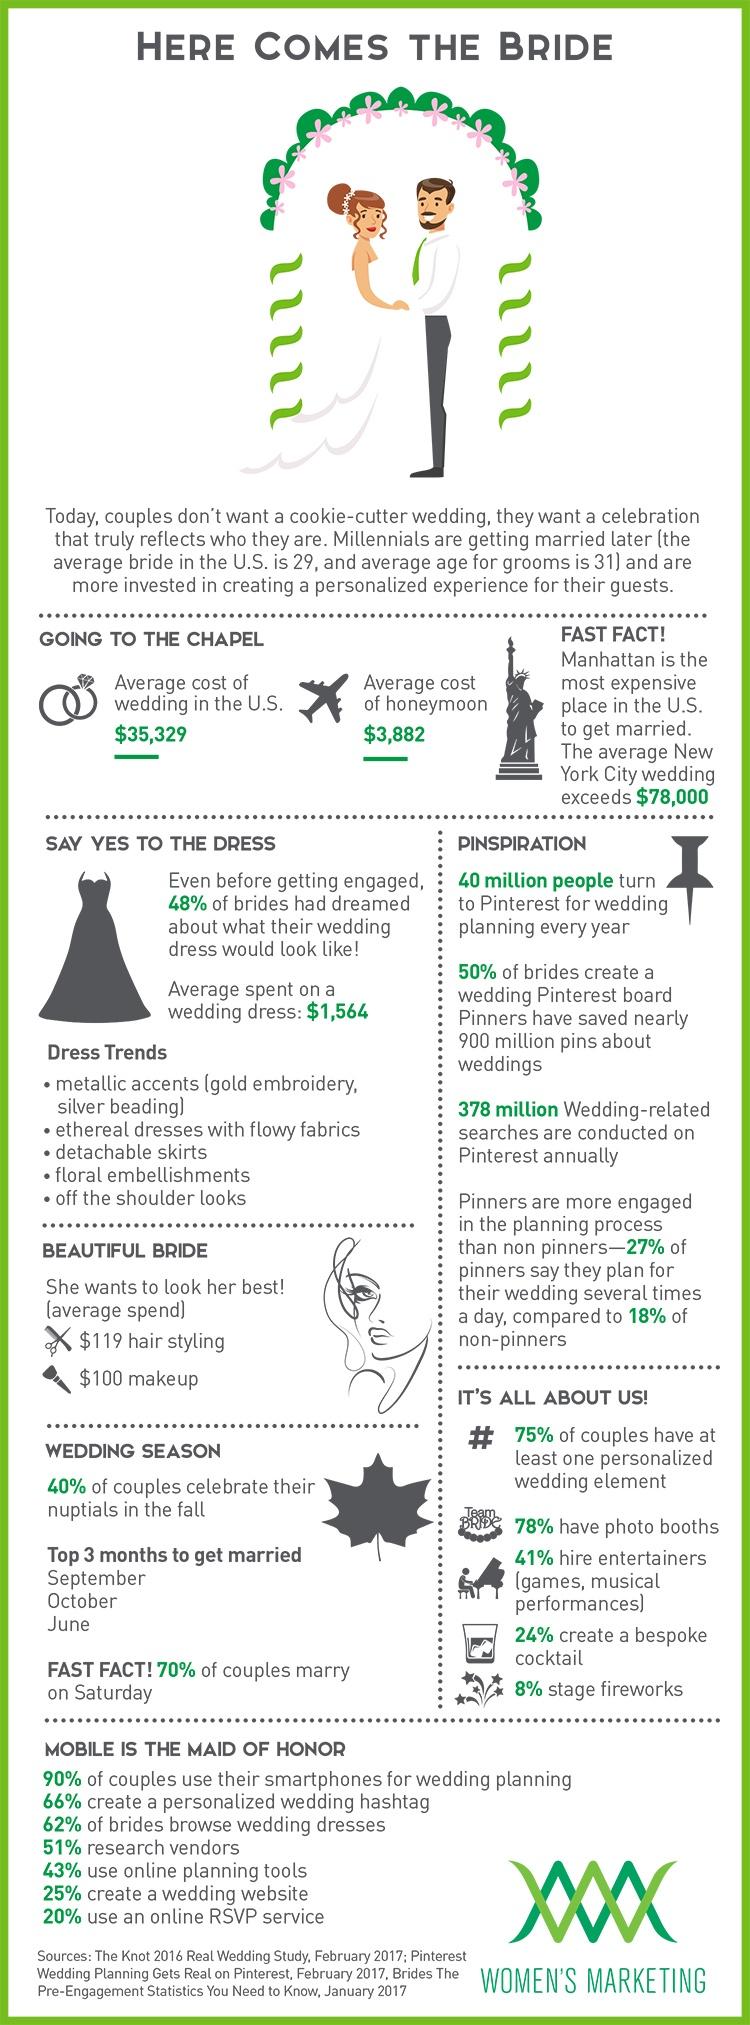 HereComesTheBride_Infographic.jpg